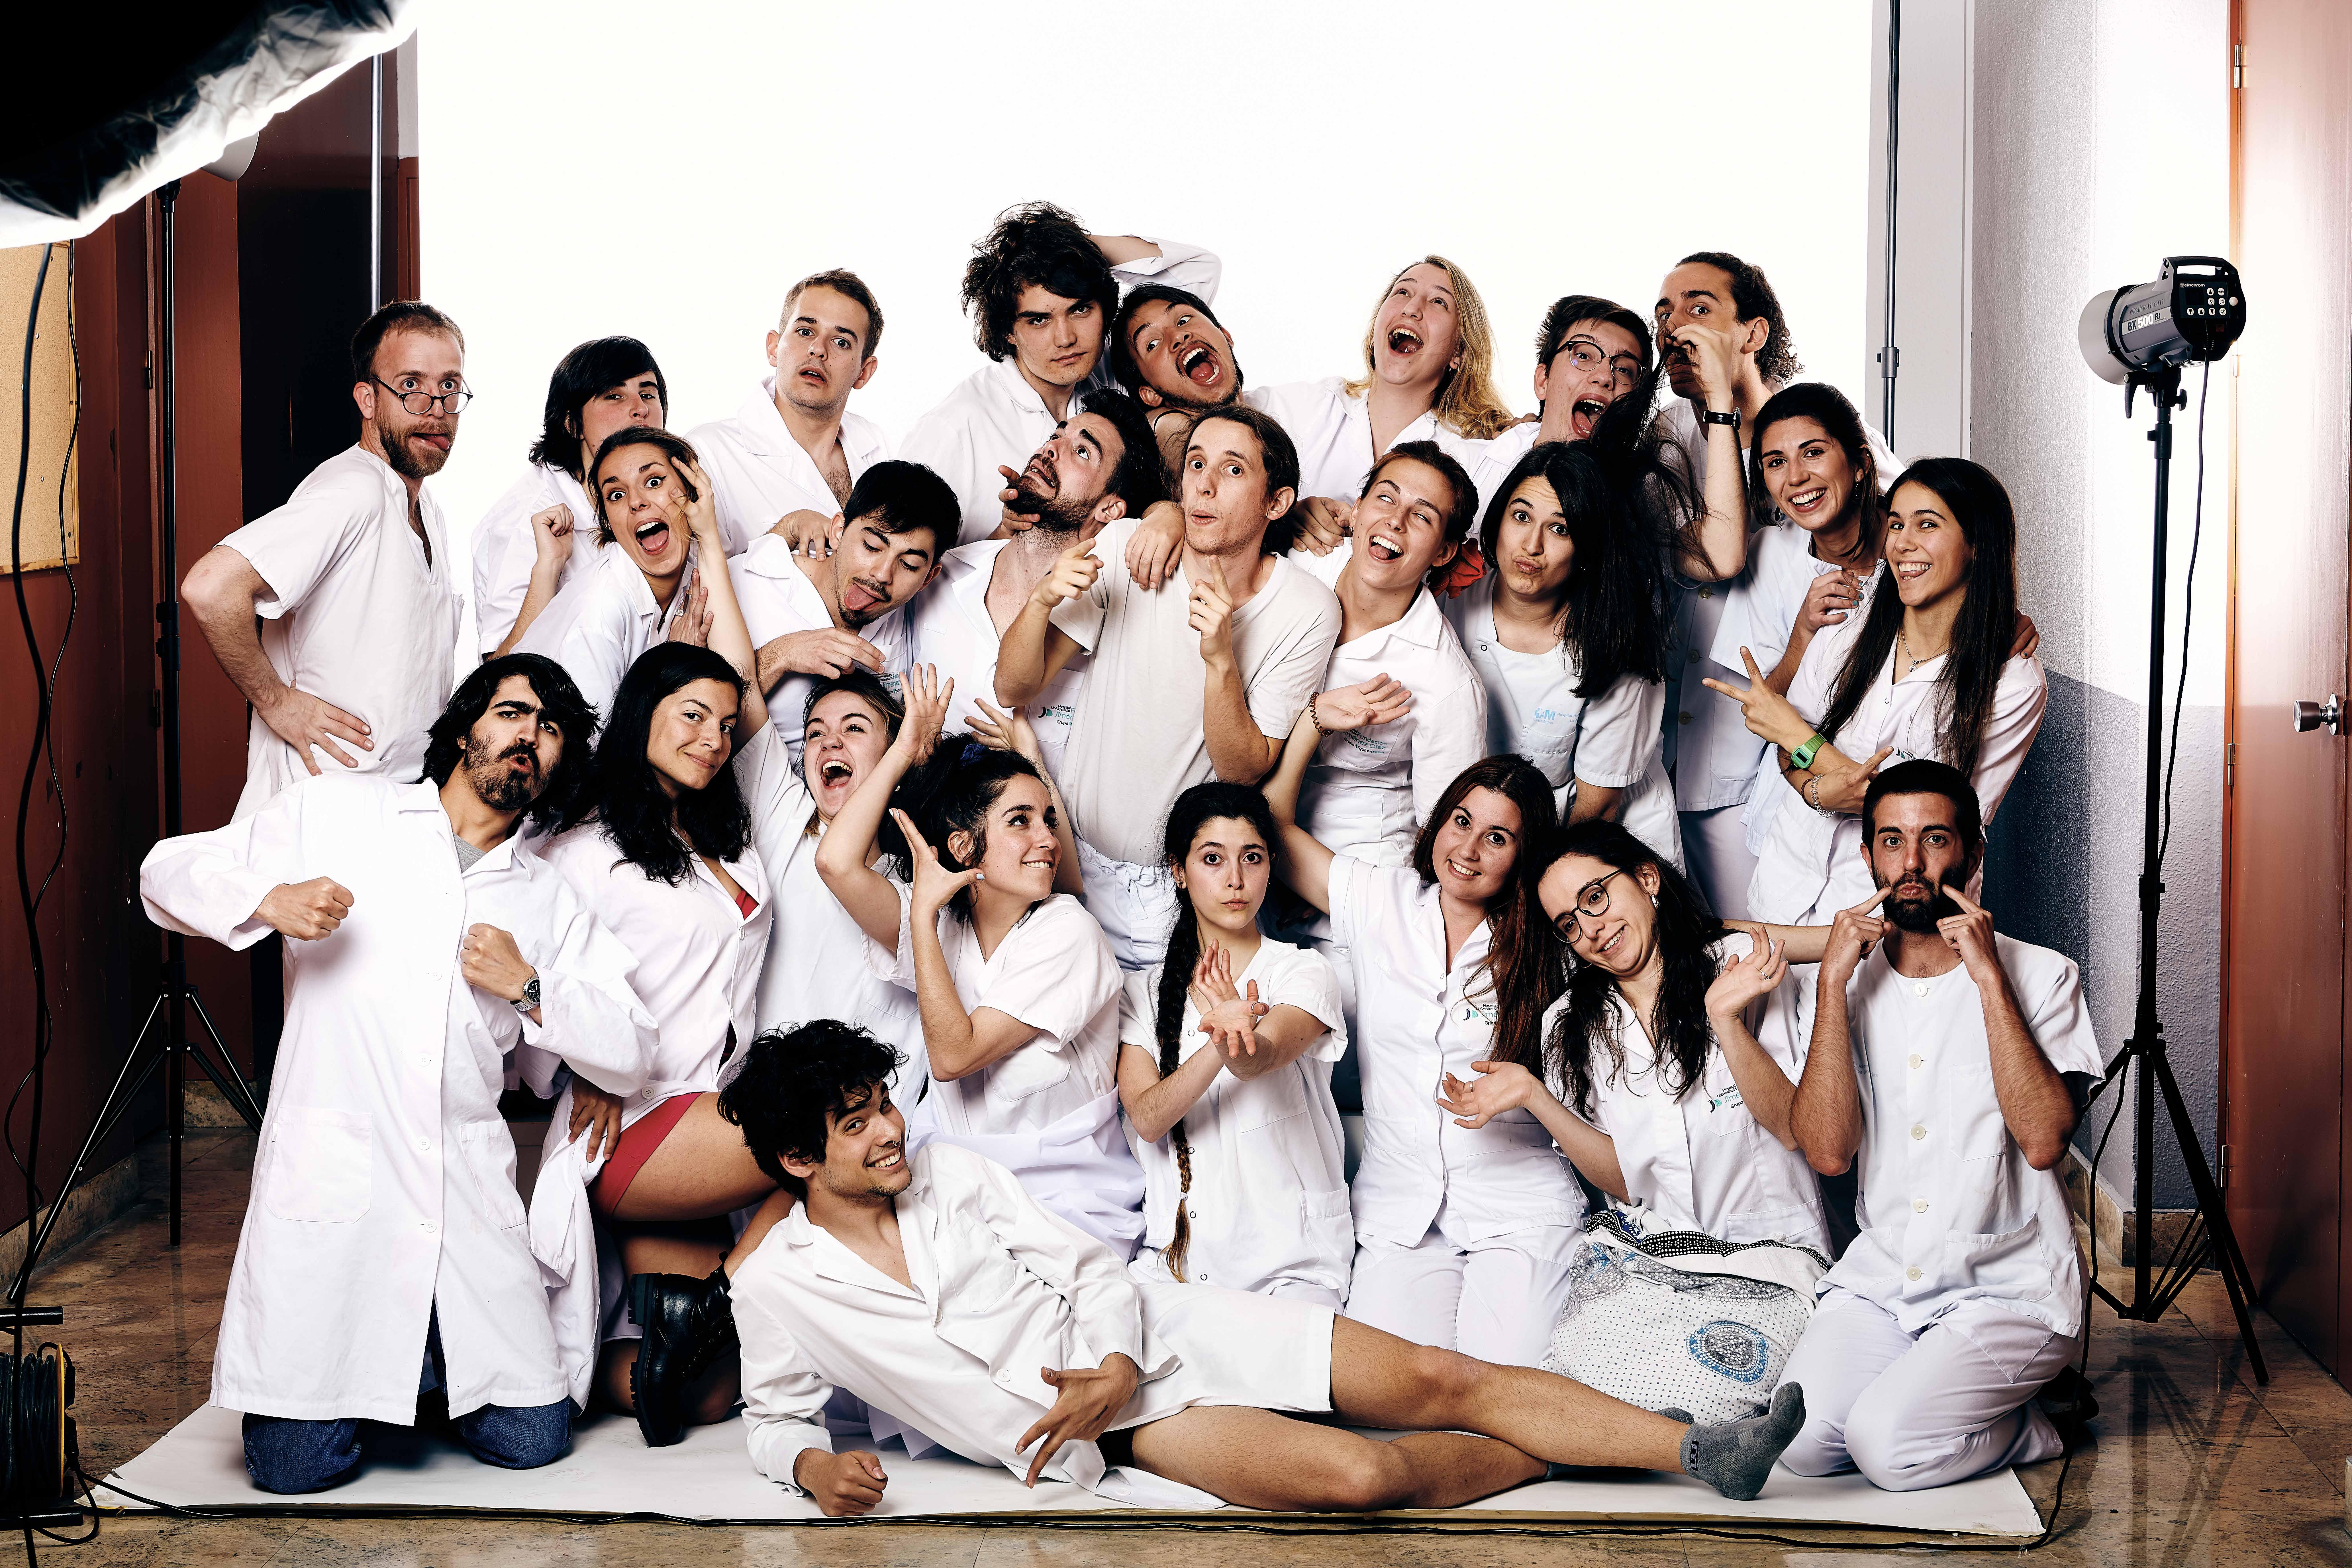 insanna commedia-nodamoscredito-NDC-teatro-foto-grupo